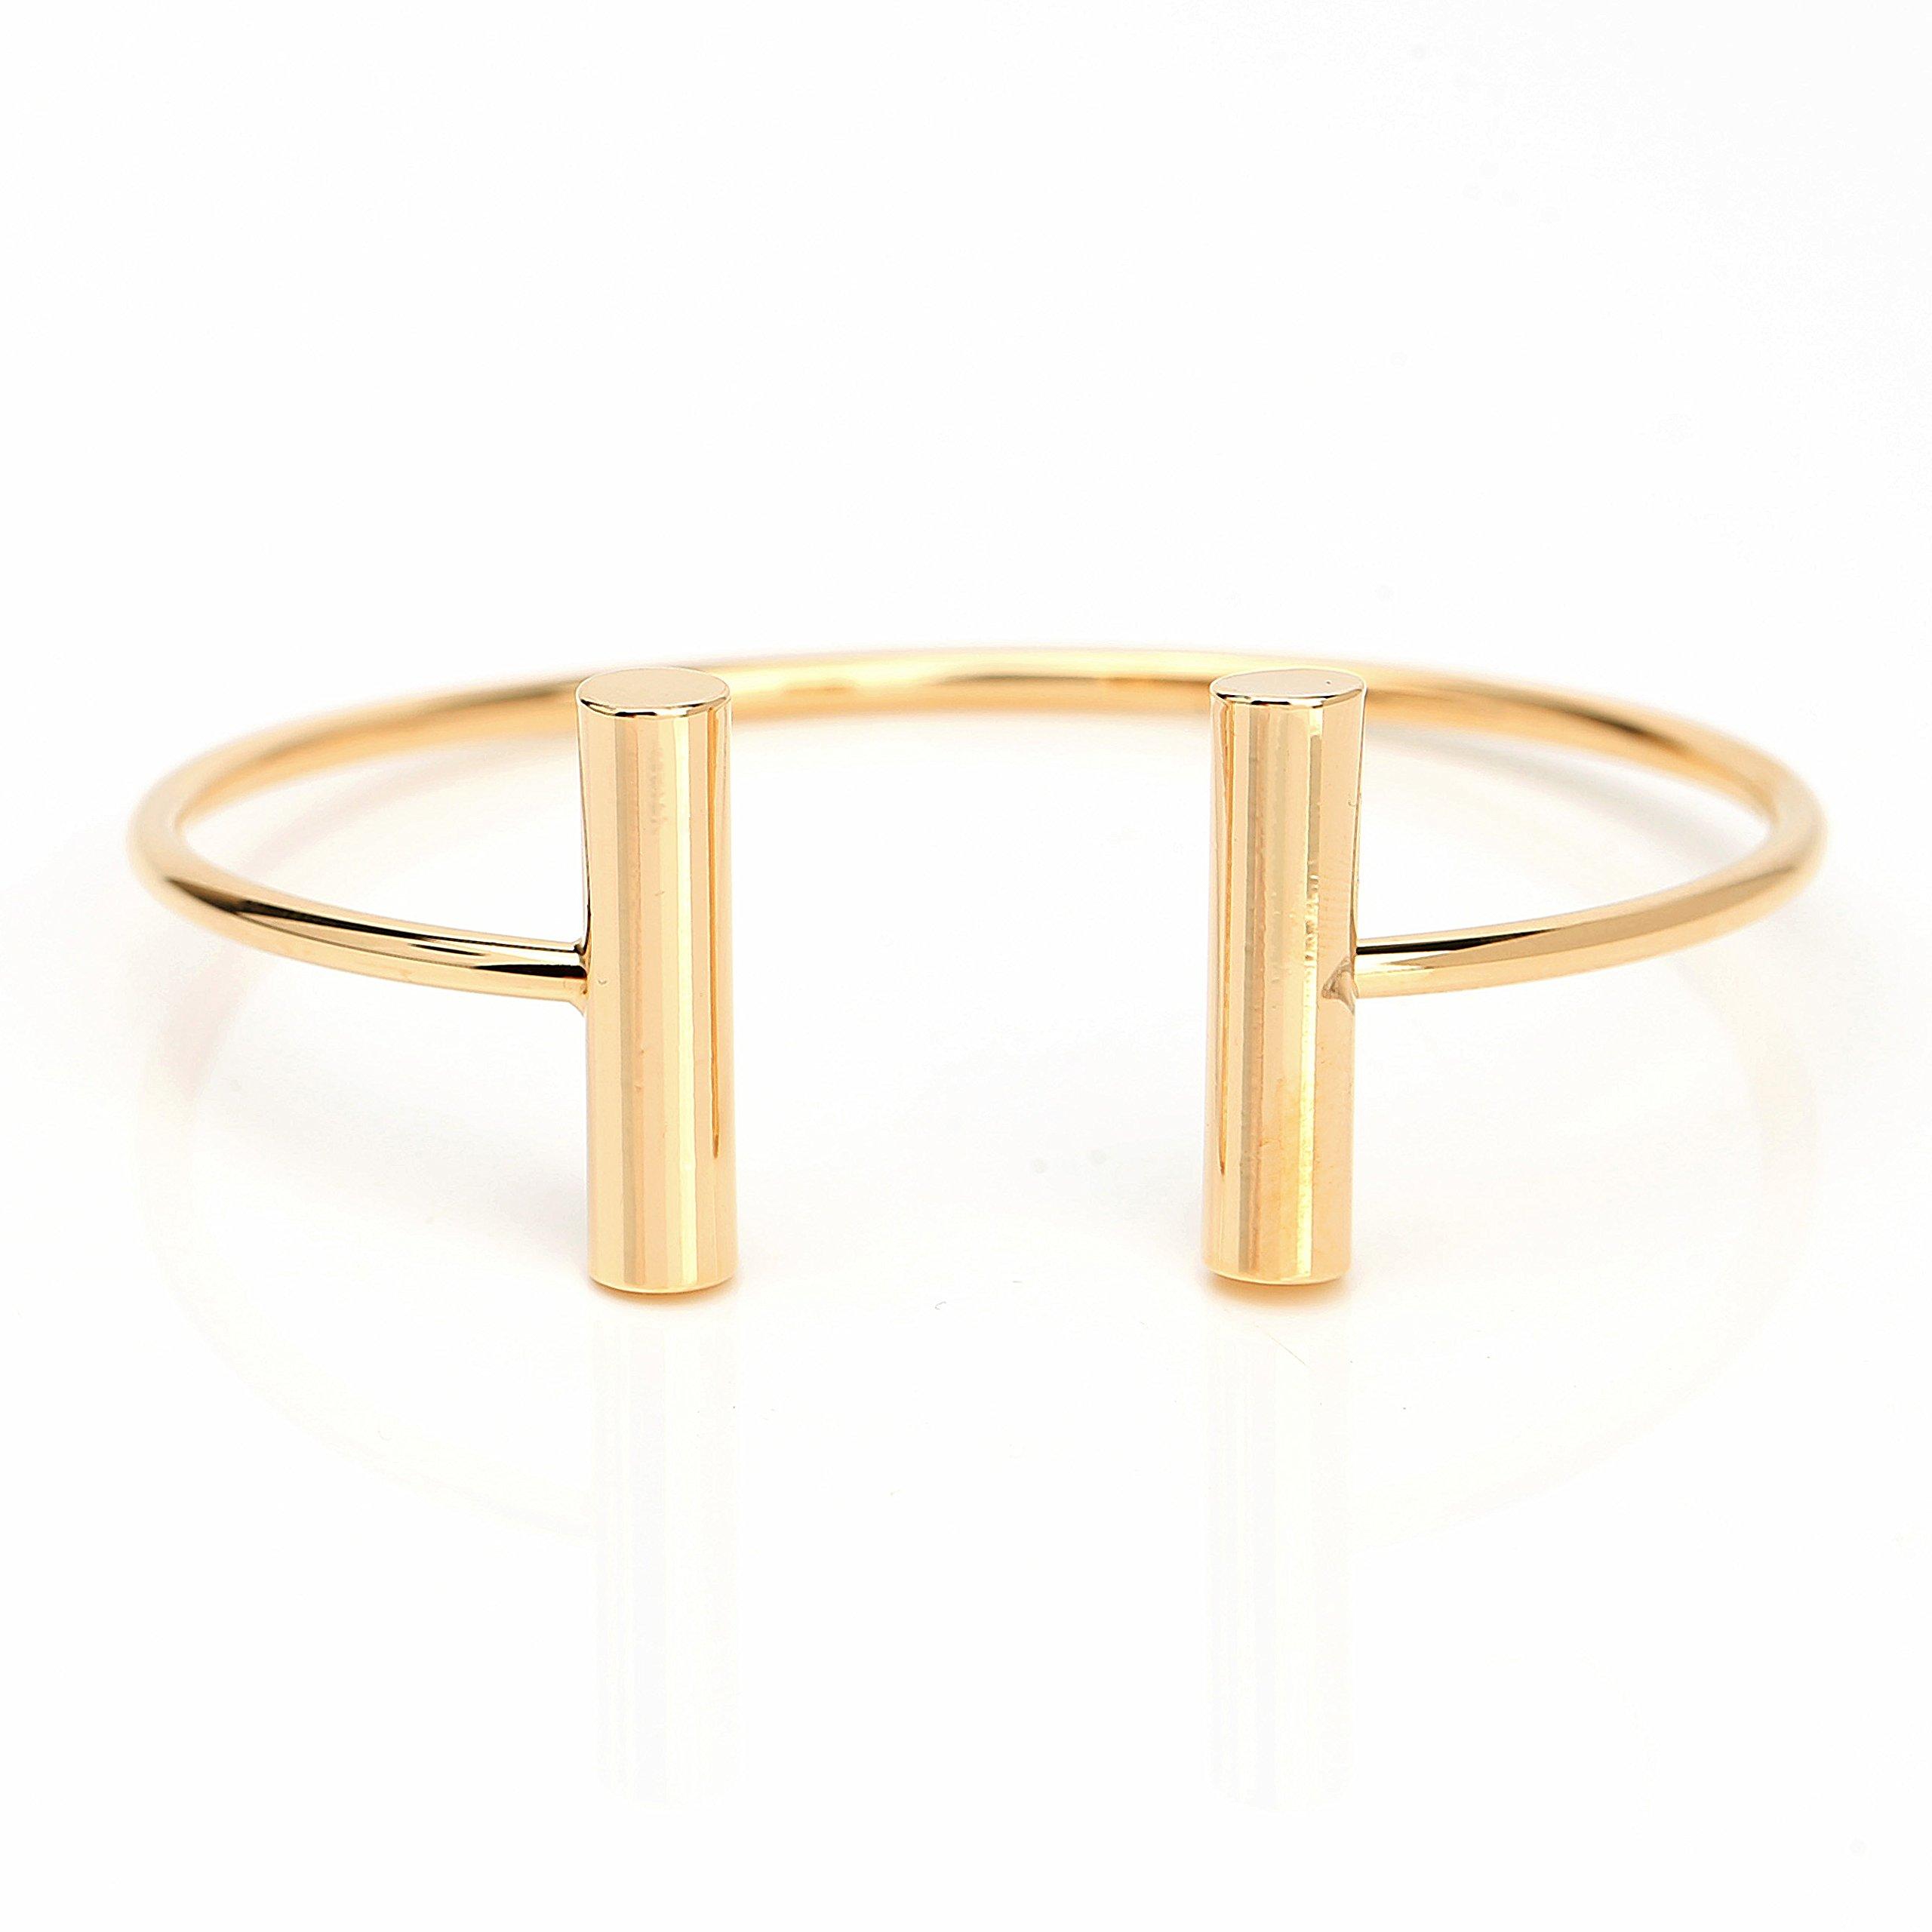 United Elegance Stylish Designer Bangle Bracelet with Contemporary T-Bar Design